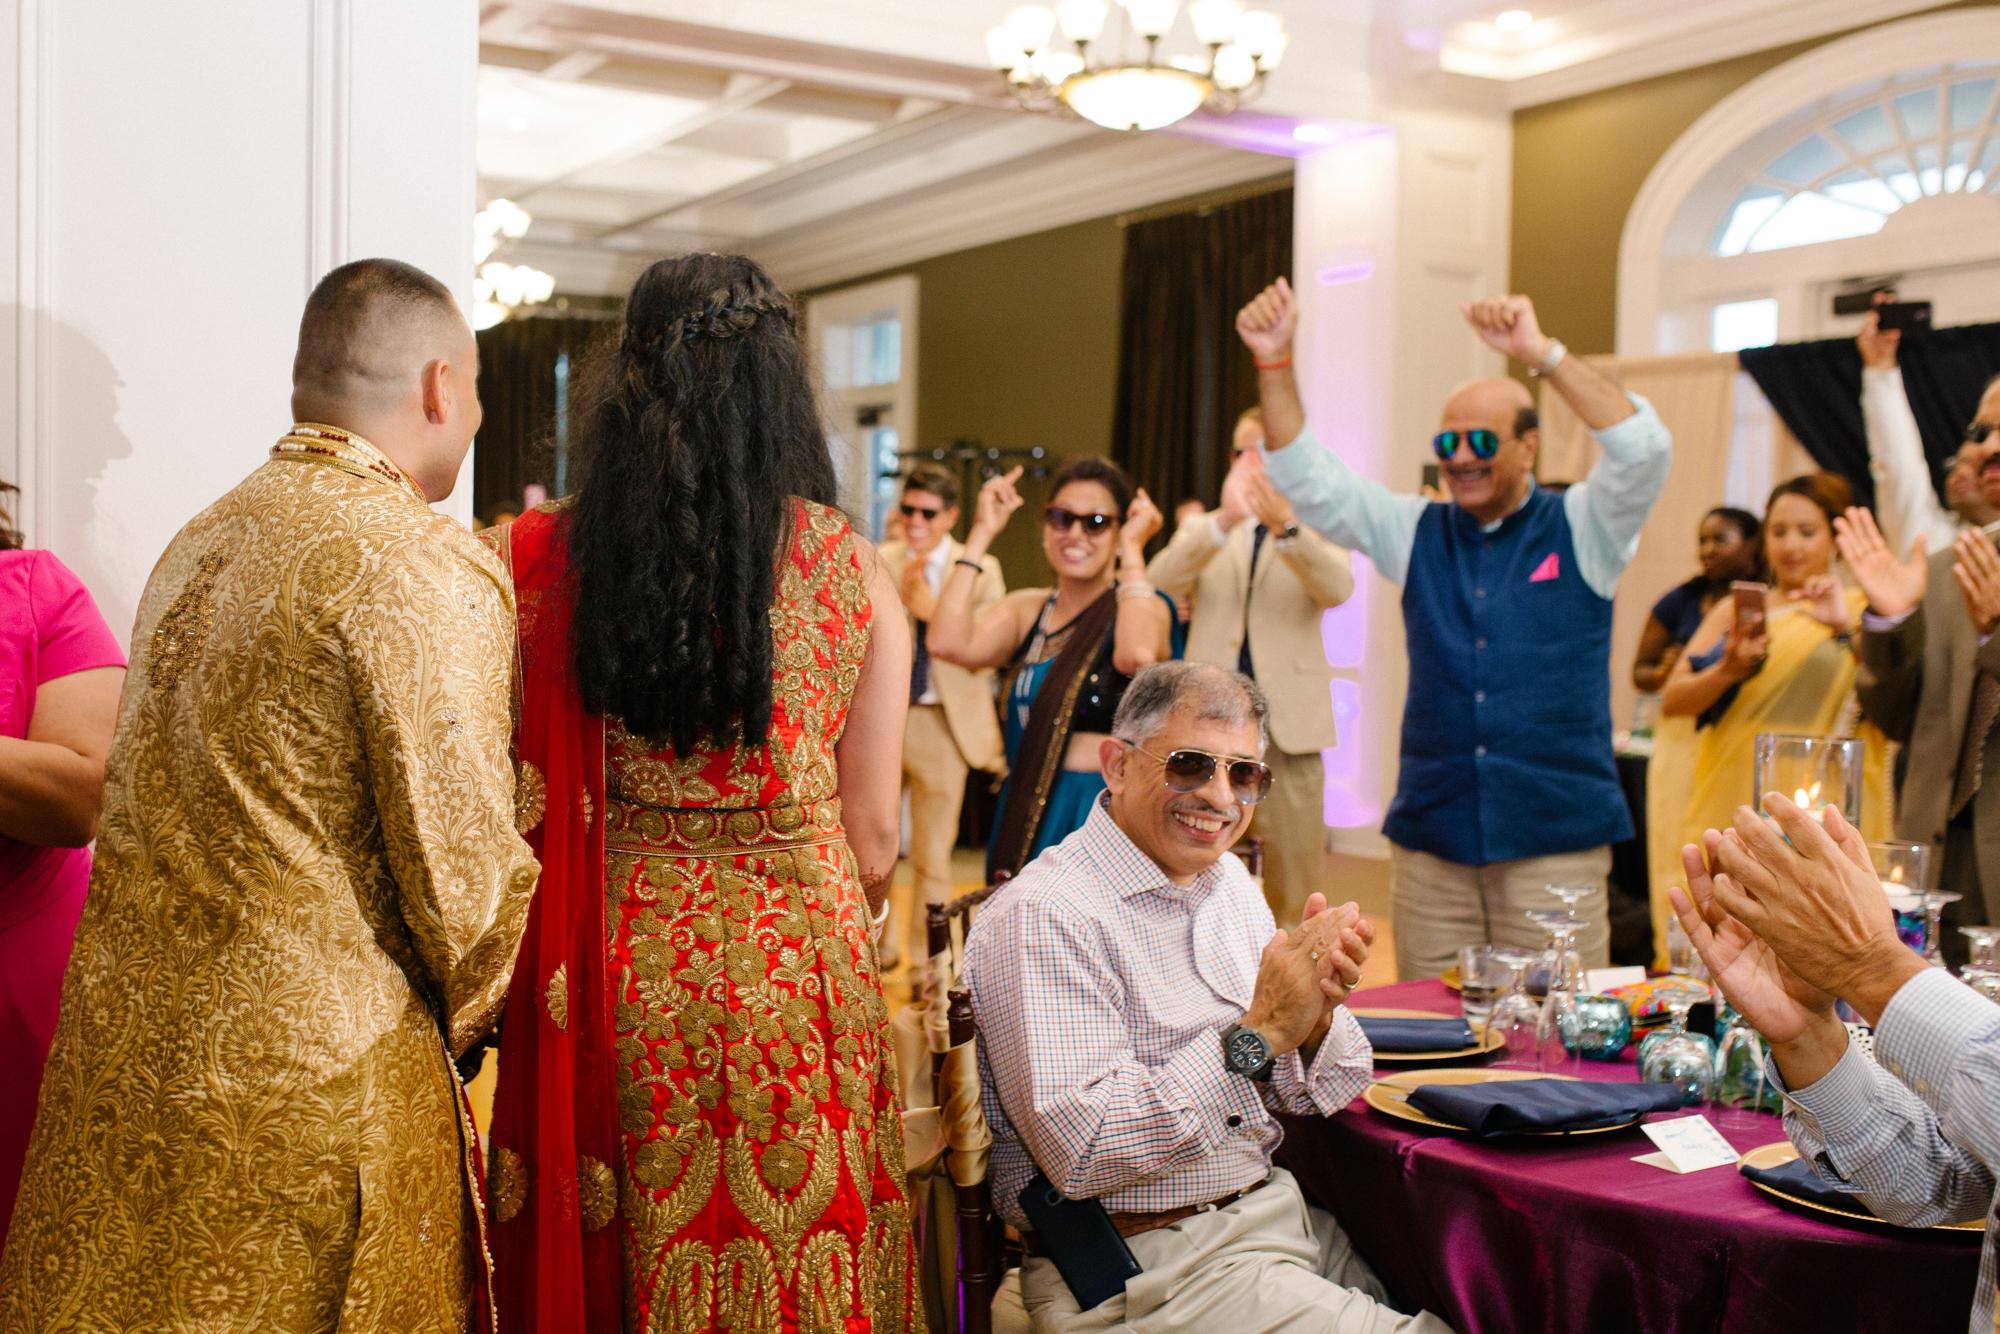 Gulfport_Wedding_Photographer_0843.jpg